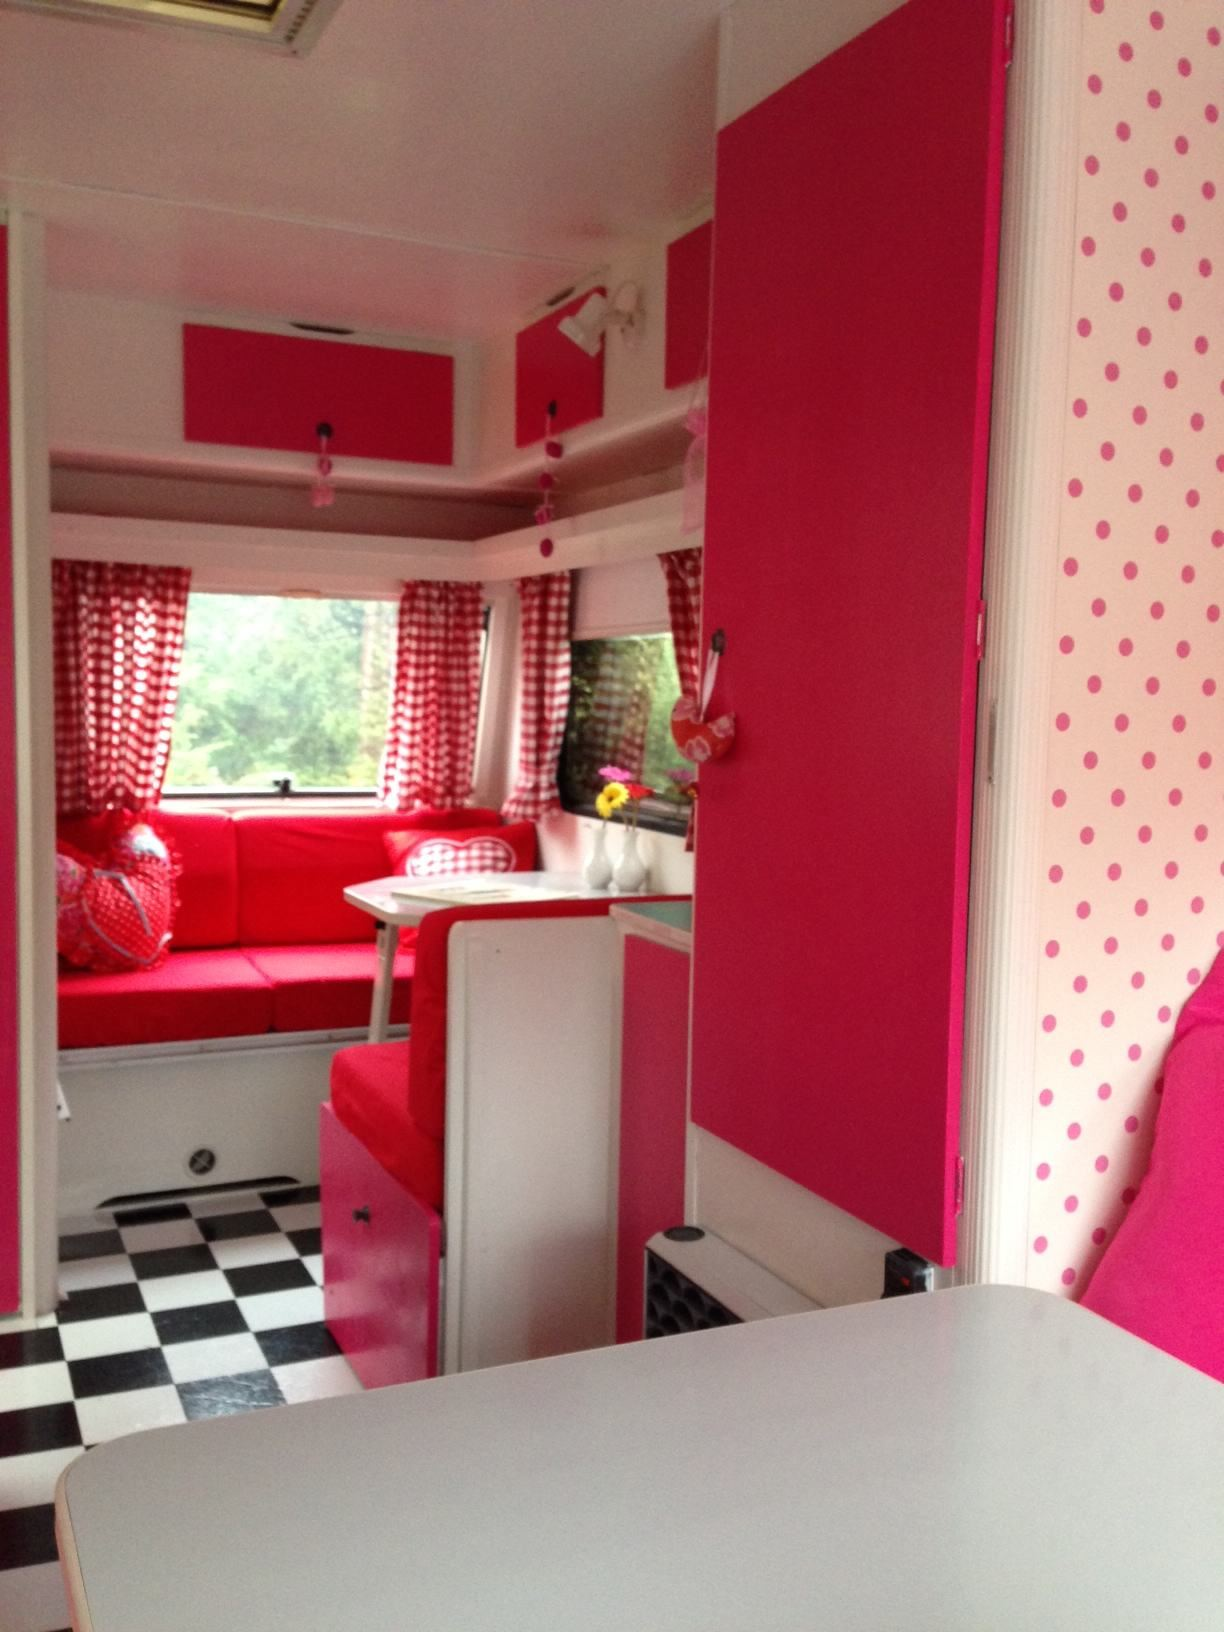 Rood met witte stippen caravanity happy campers lifestyle - Cabine slaapkamer meisje ...